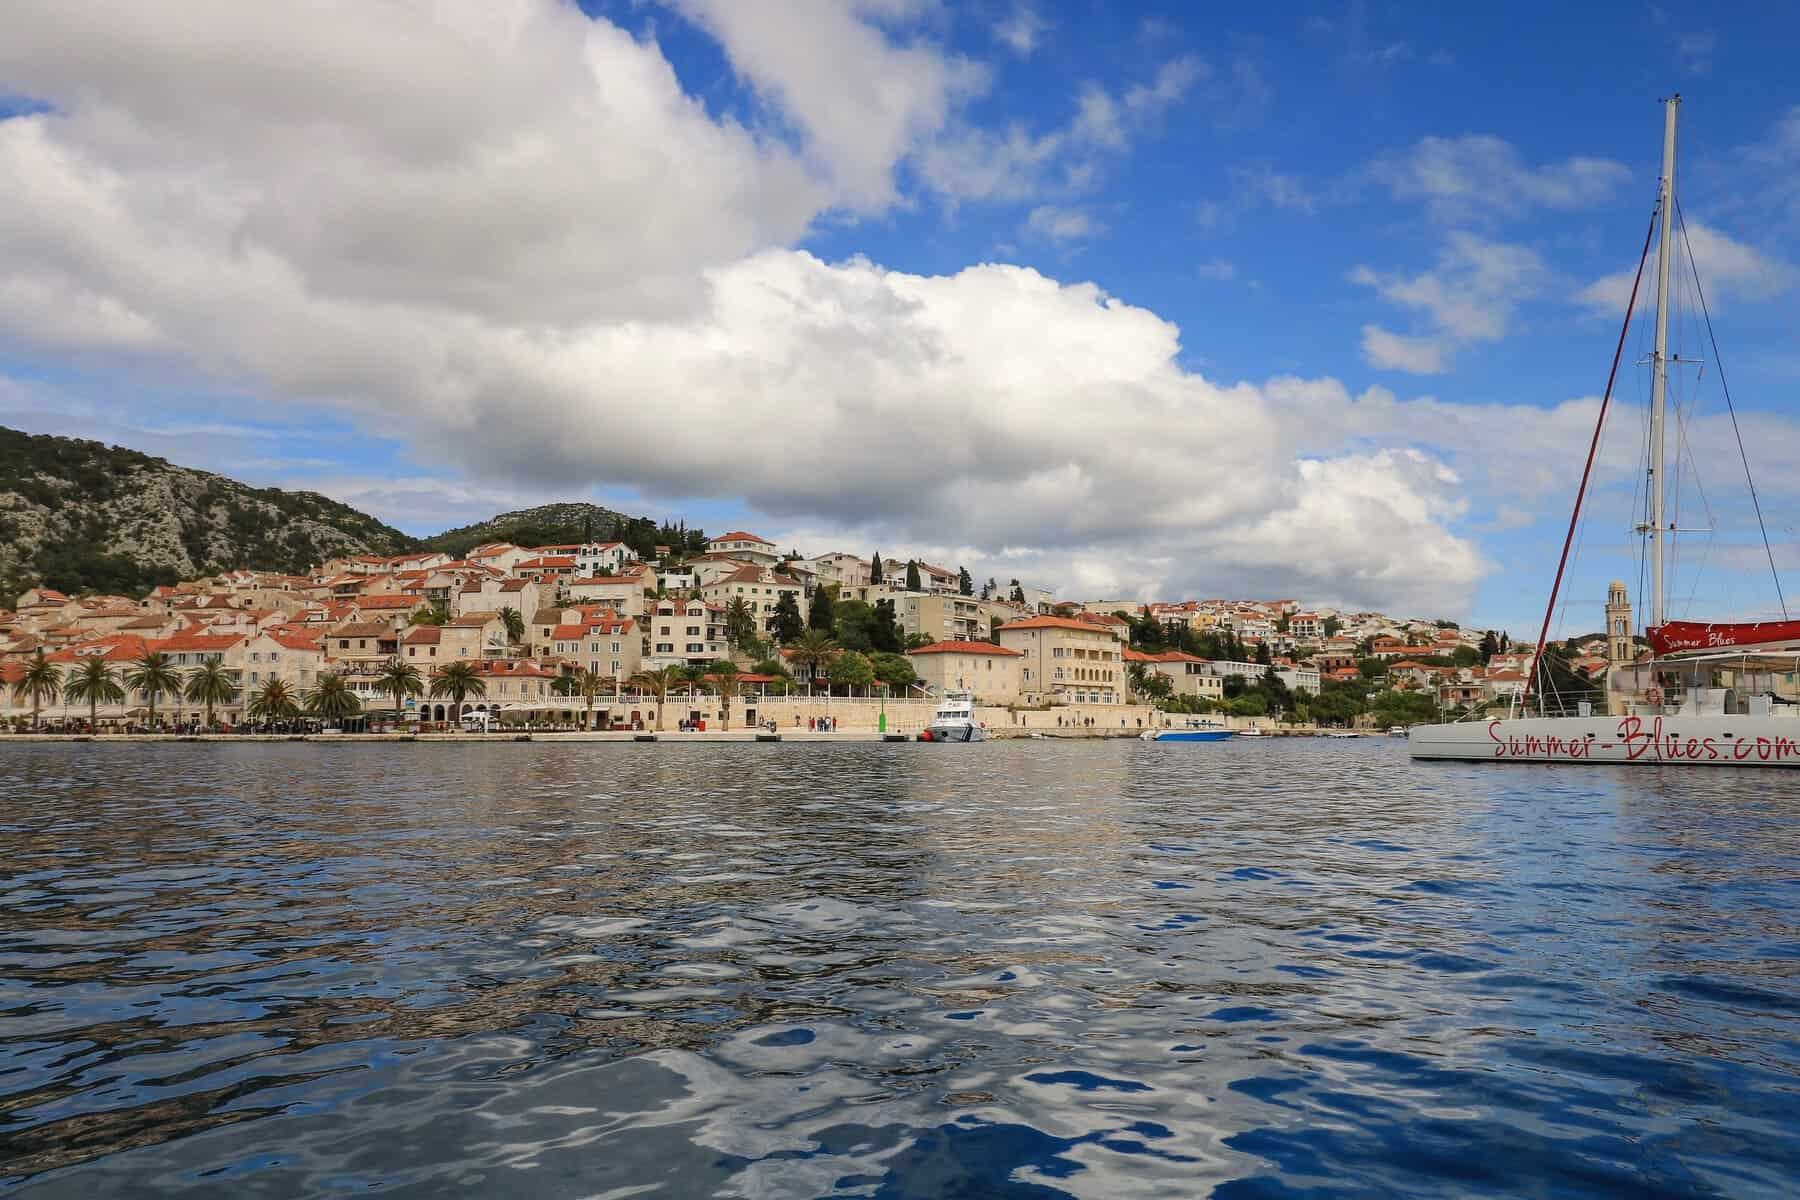 Andrea Montenegro En Latin Lover 15 top things to do in split, croatia - traveling ness